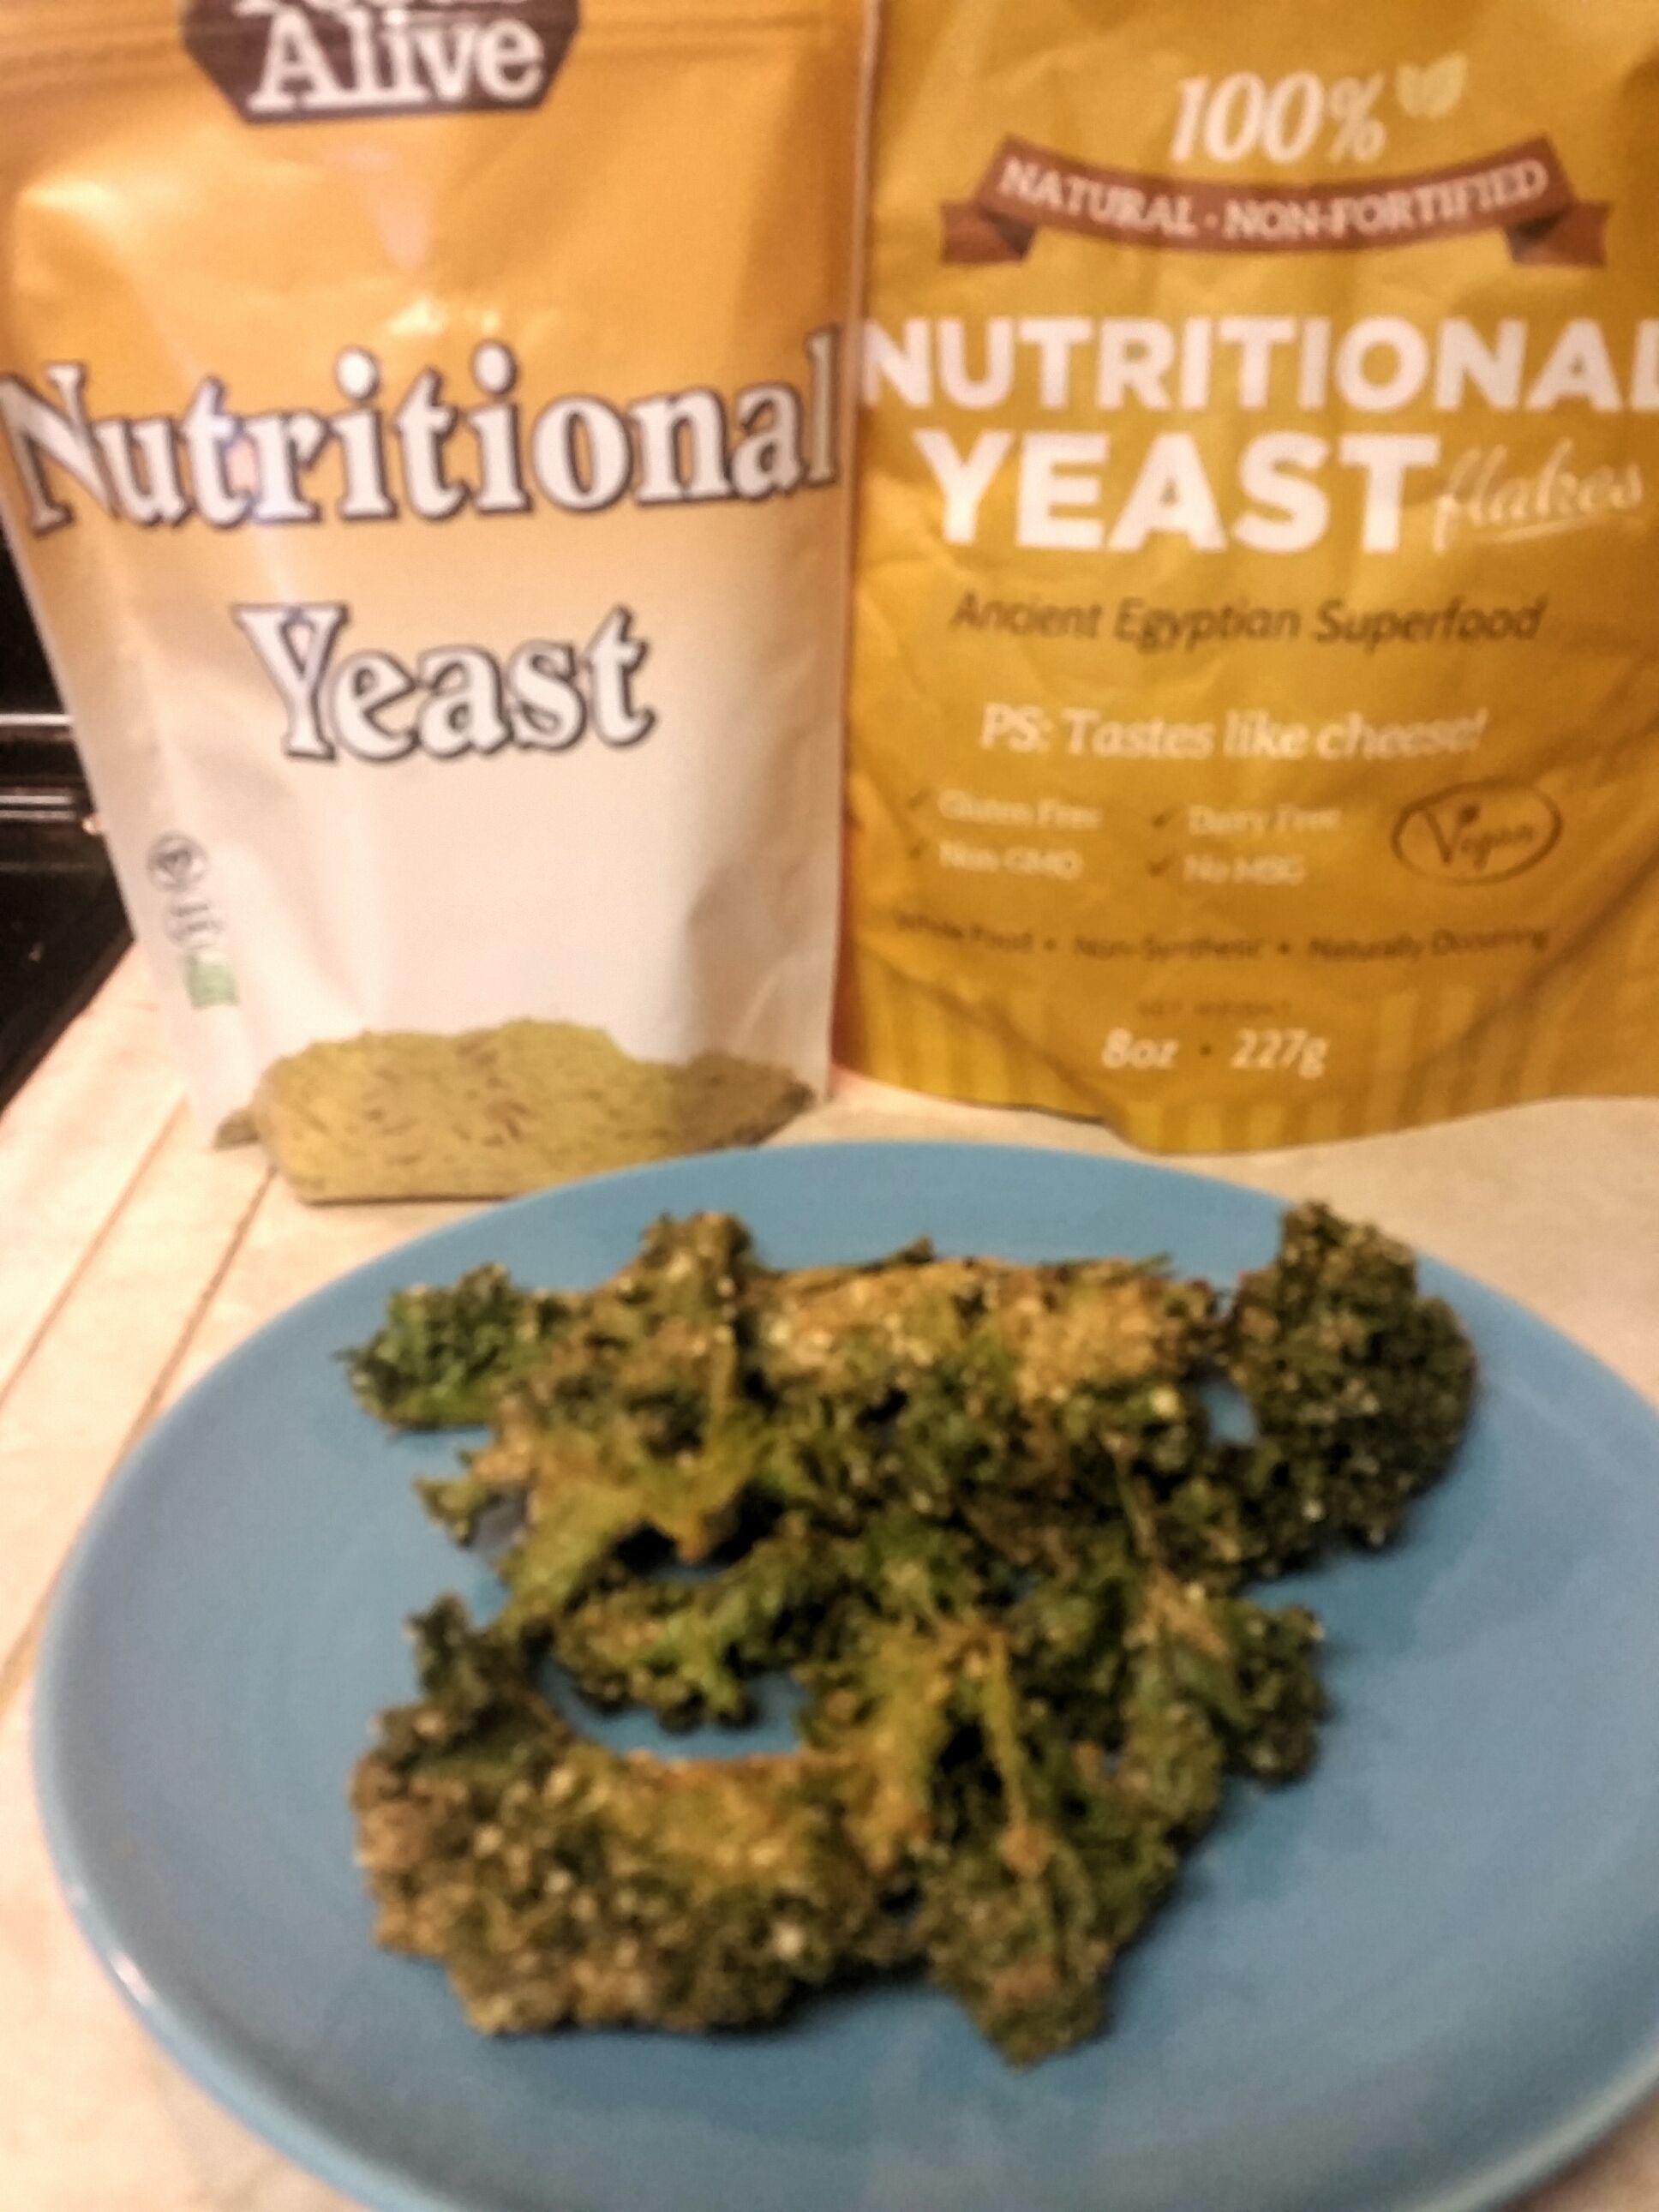 Cornfree nutritional yeast nutritional yeast paleo